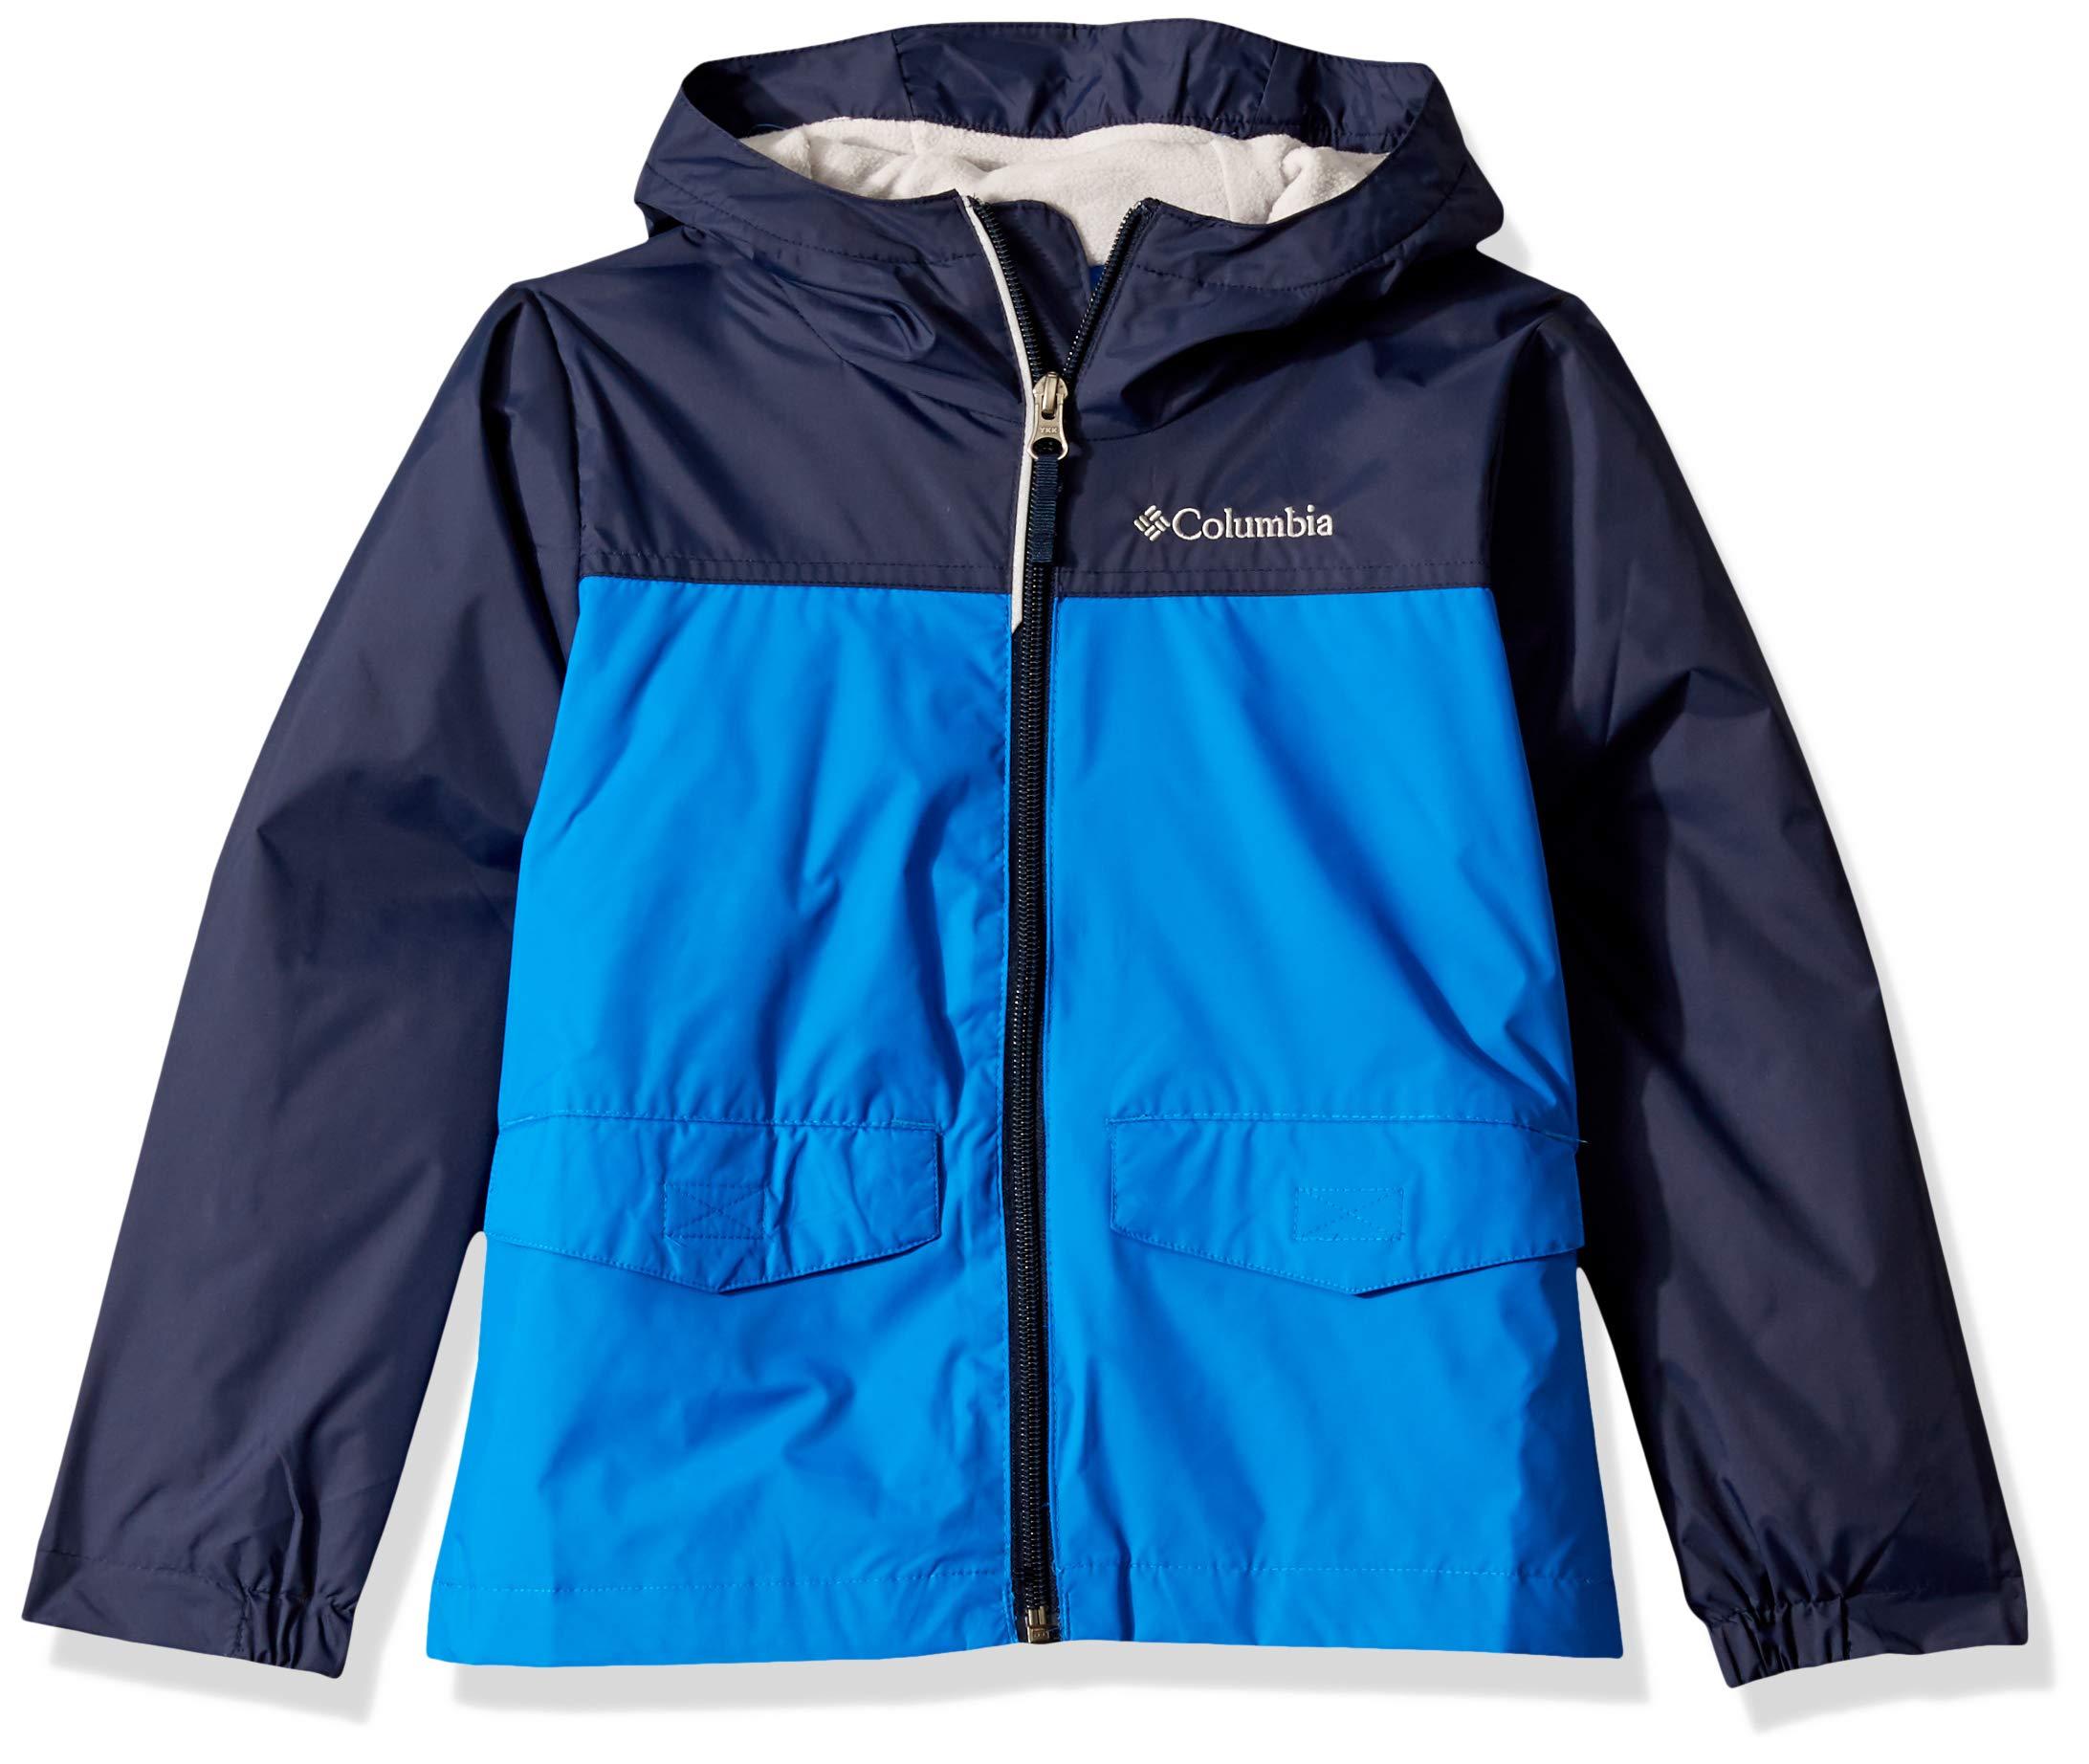 Columbia Boys' Big Rain-Zilla Jacket, Super Blue/Collegiate Navy, Medium